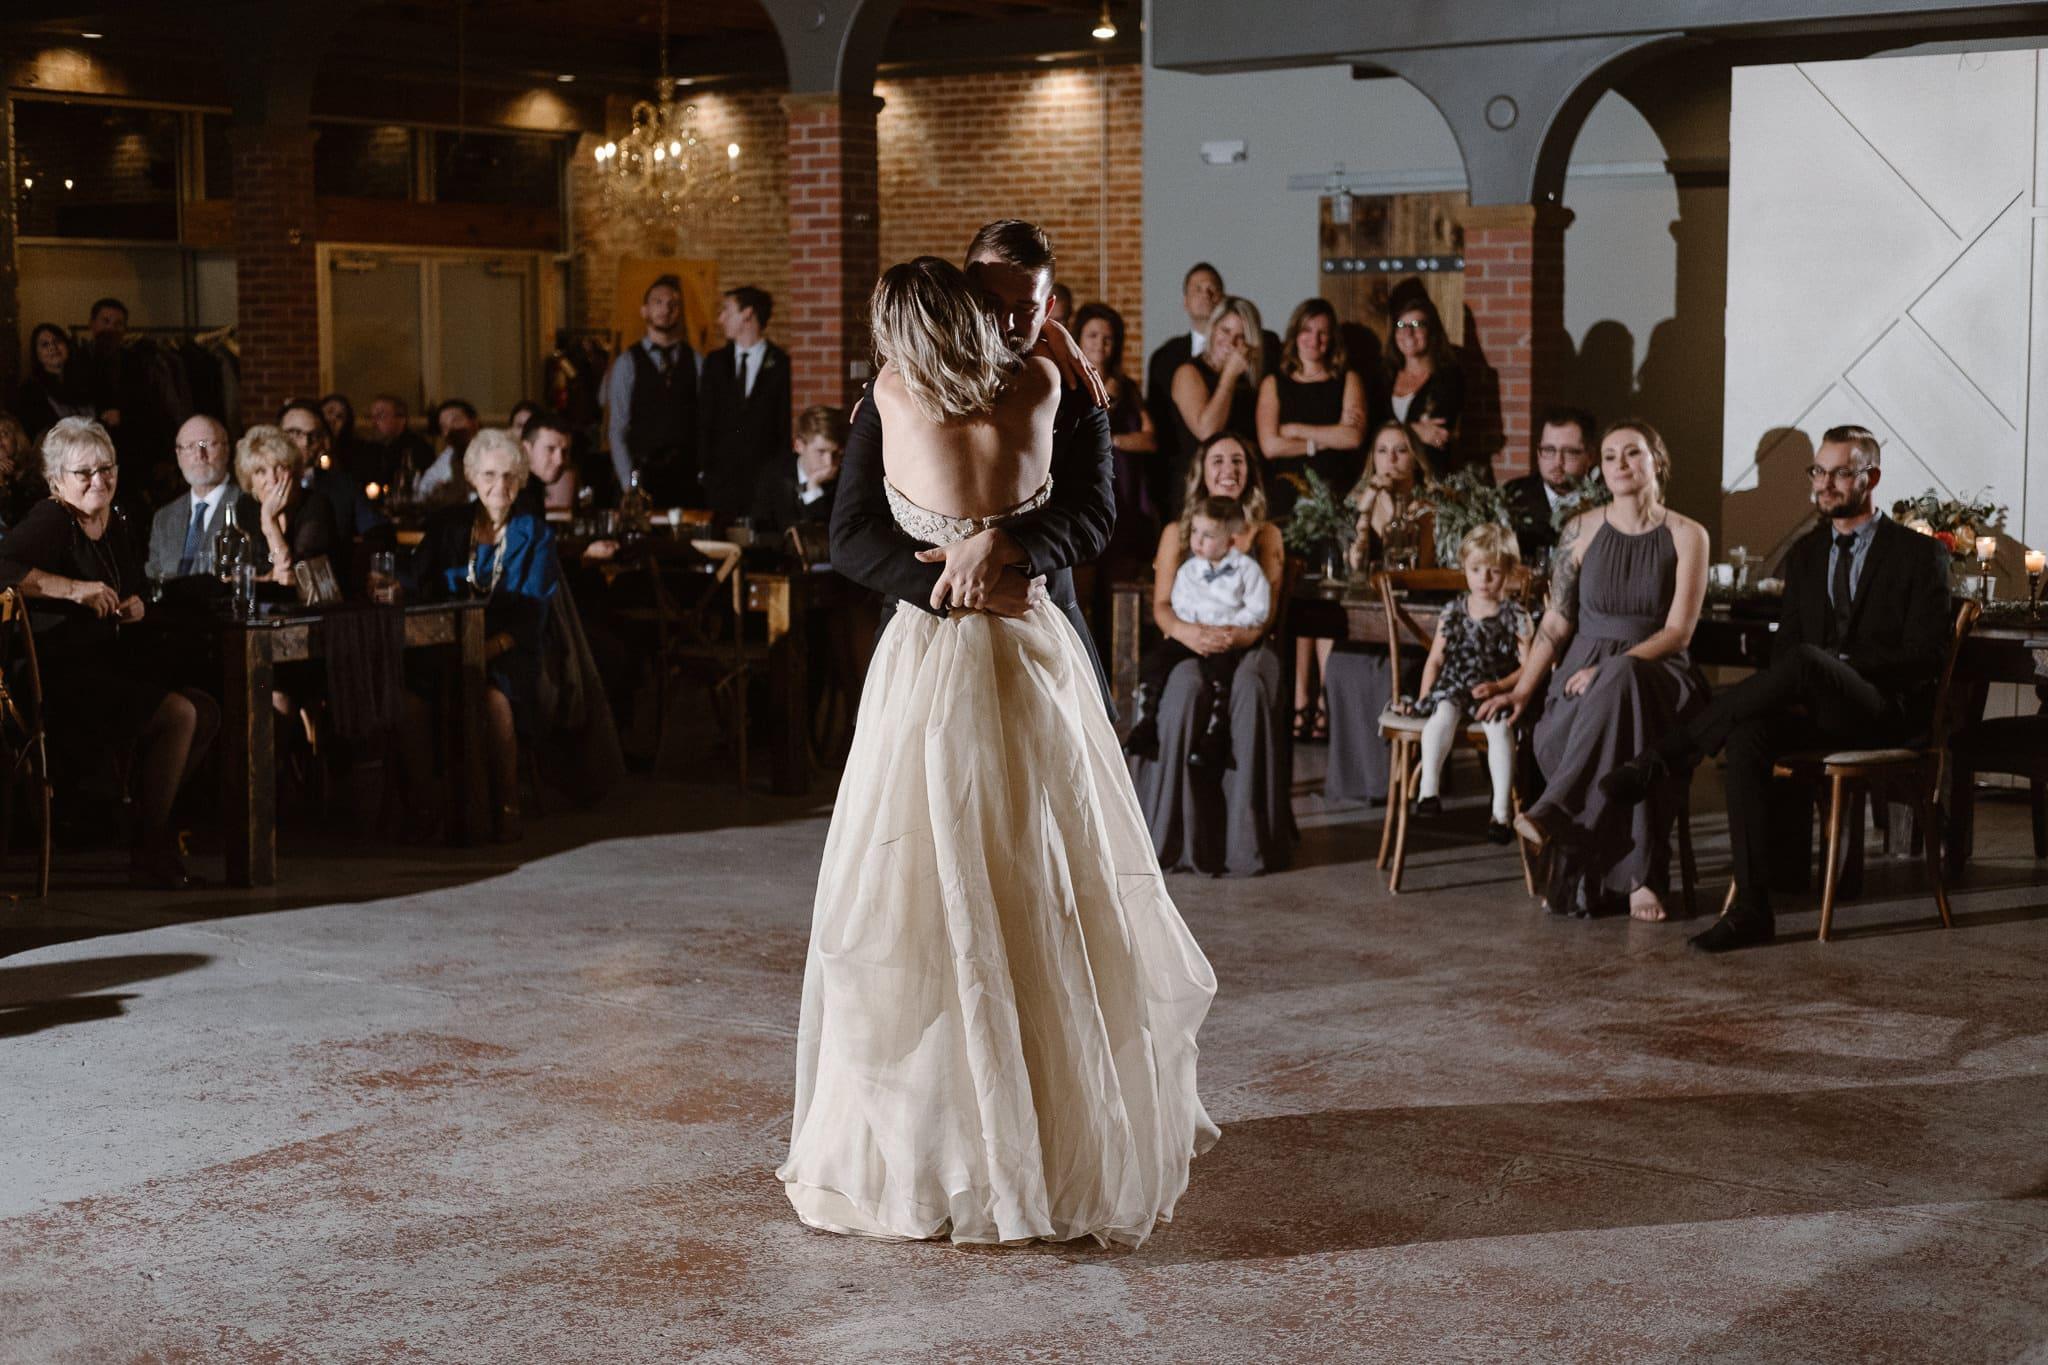 St Vrain Wedding Photographer | Longmont Wedding Photographer | Colorado Winter Wedding Photographer, Colorado industrial chic wedding ceremony, bride and groom first dance, off camera flash photography reception lighting